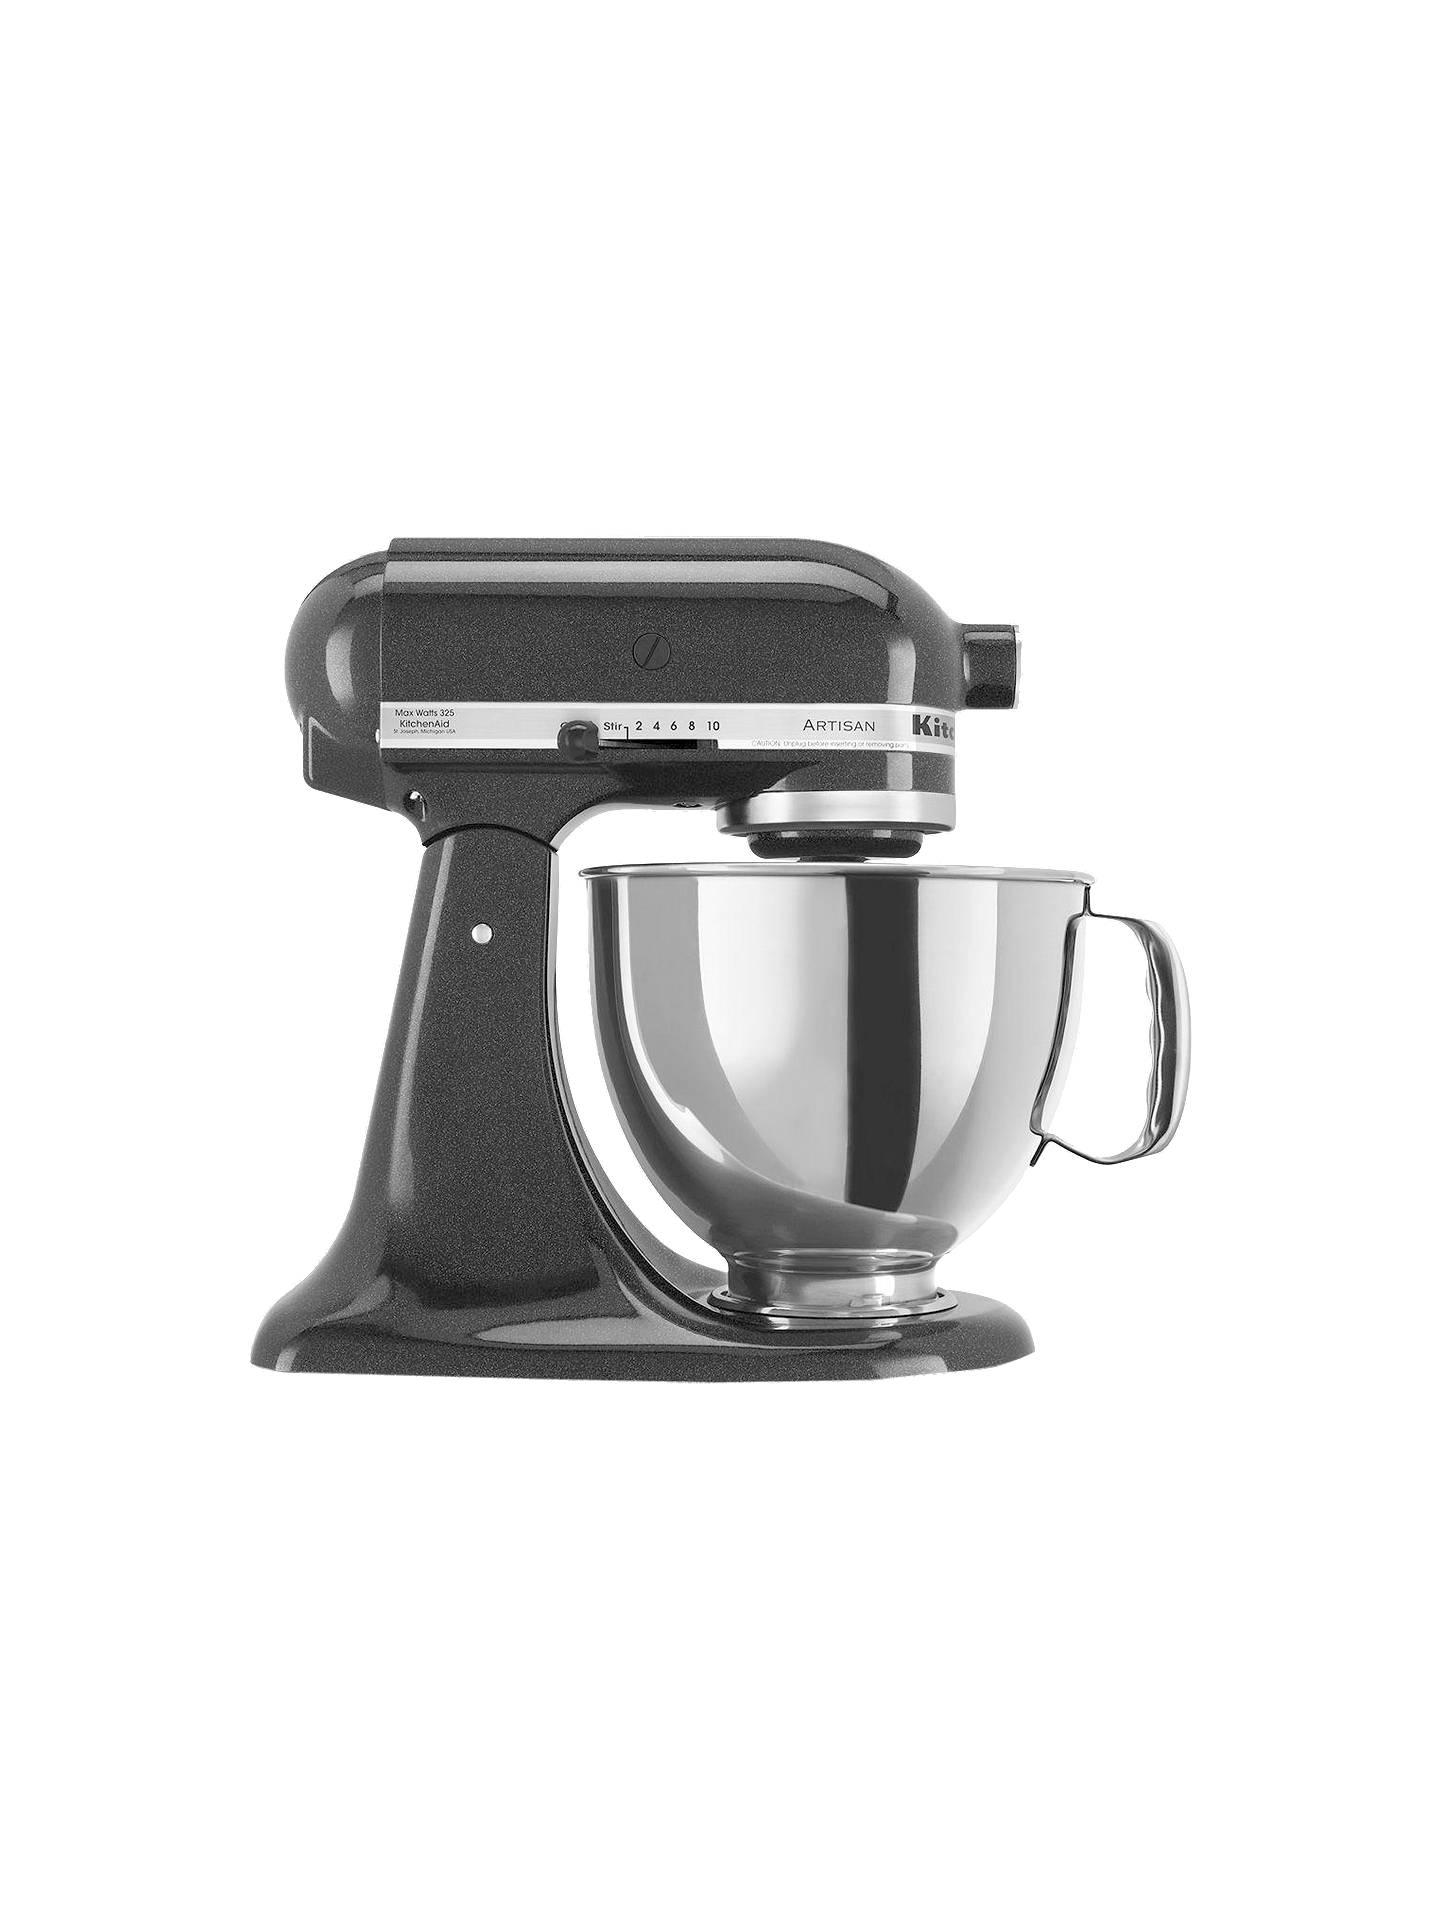 Kitchenaid 150 Artisan 4 8l Stand Mixer Black Caviar